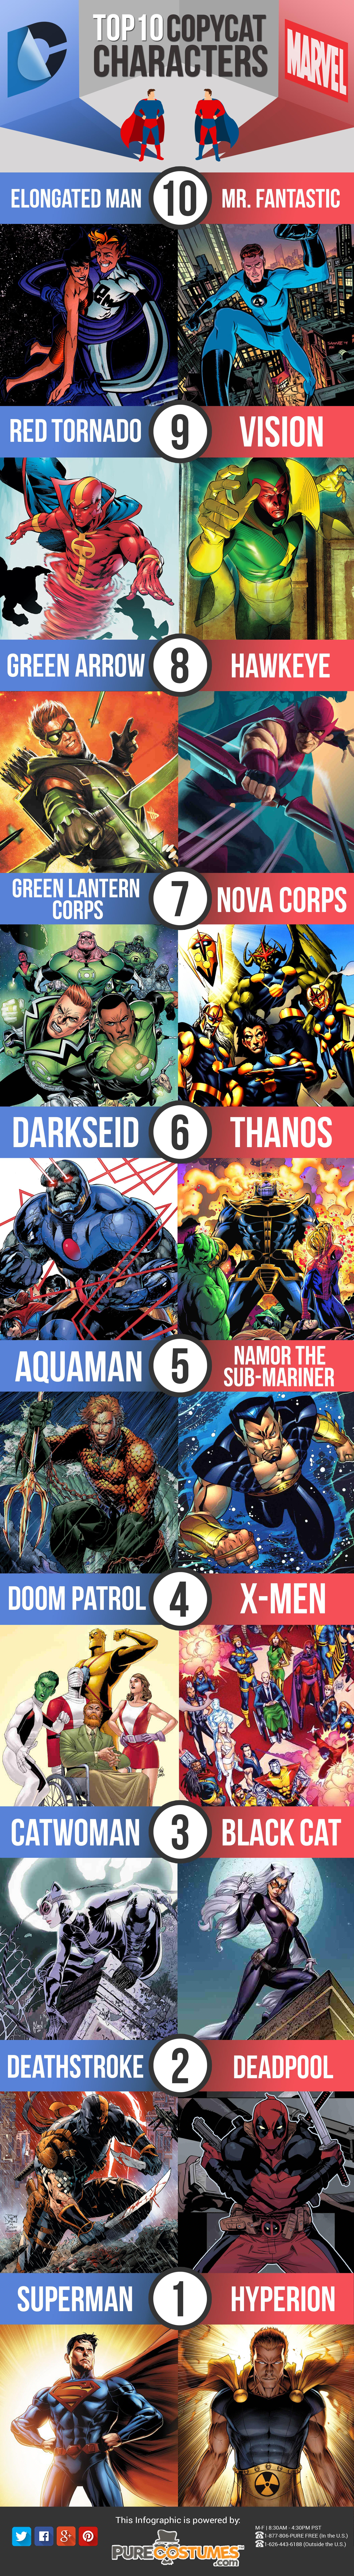 DC vs Marvel: Copycat Characters